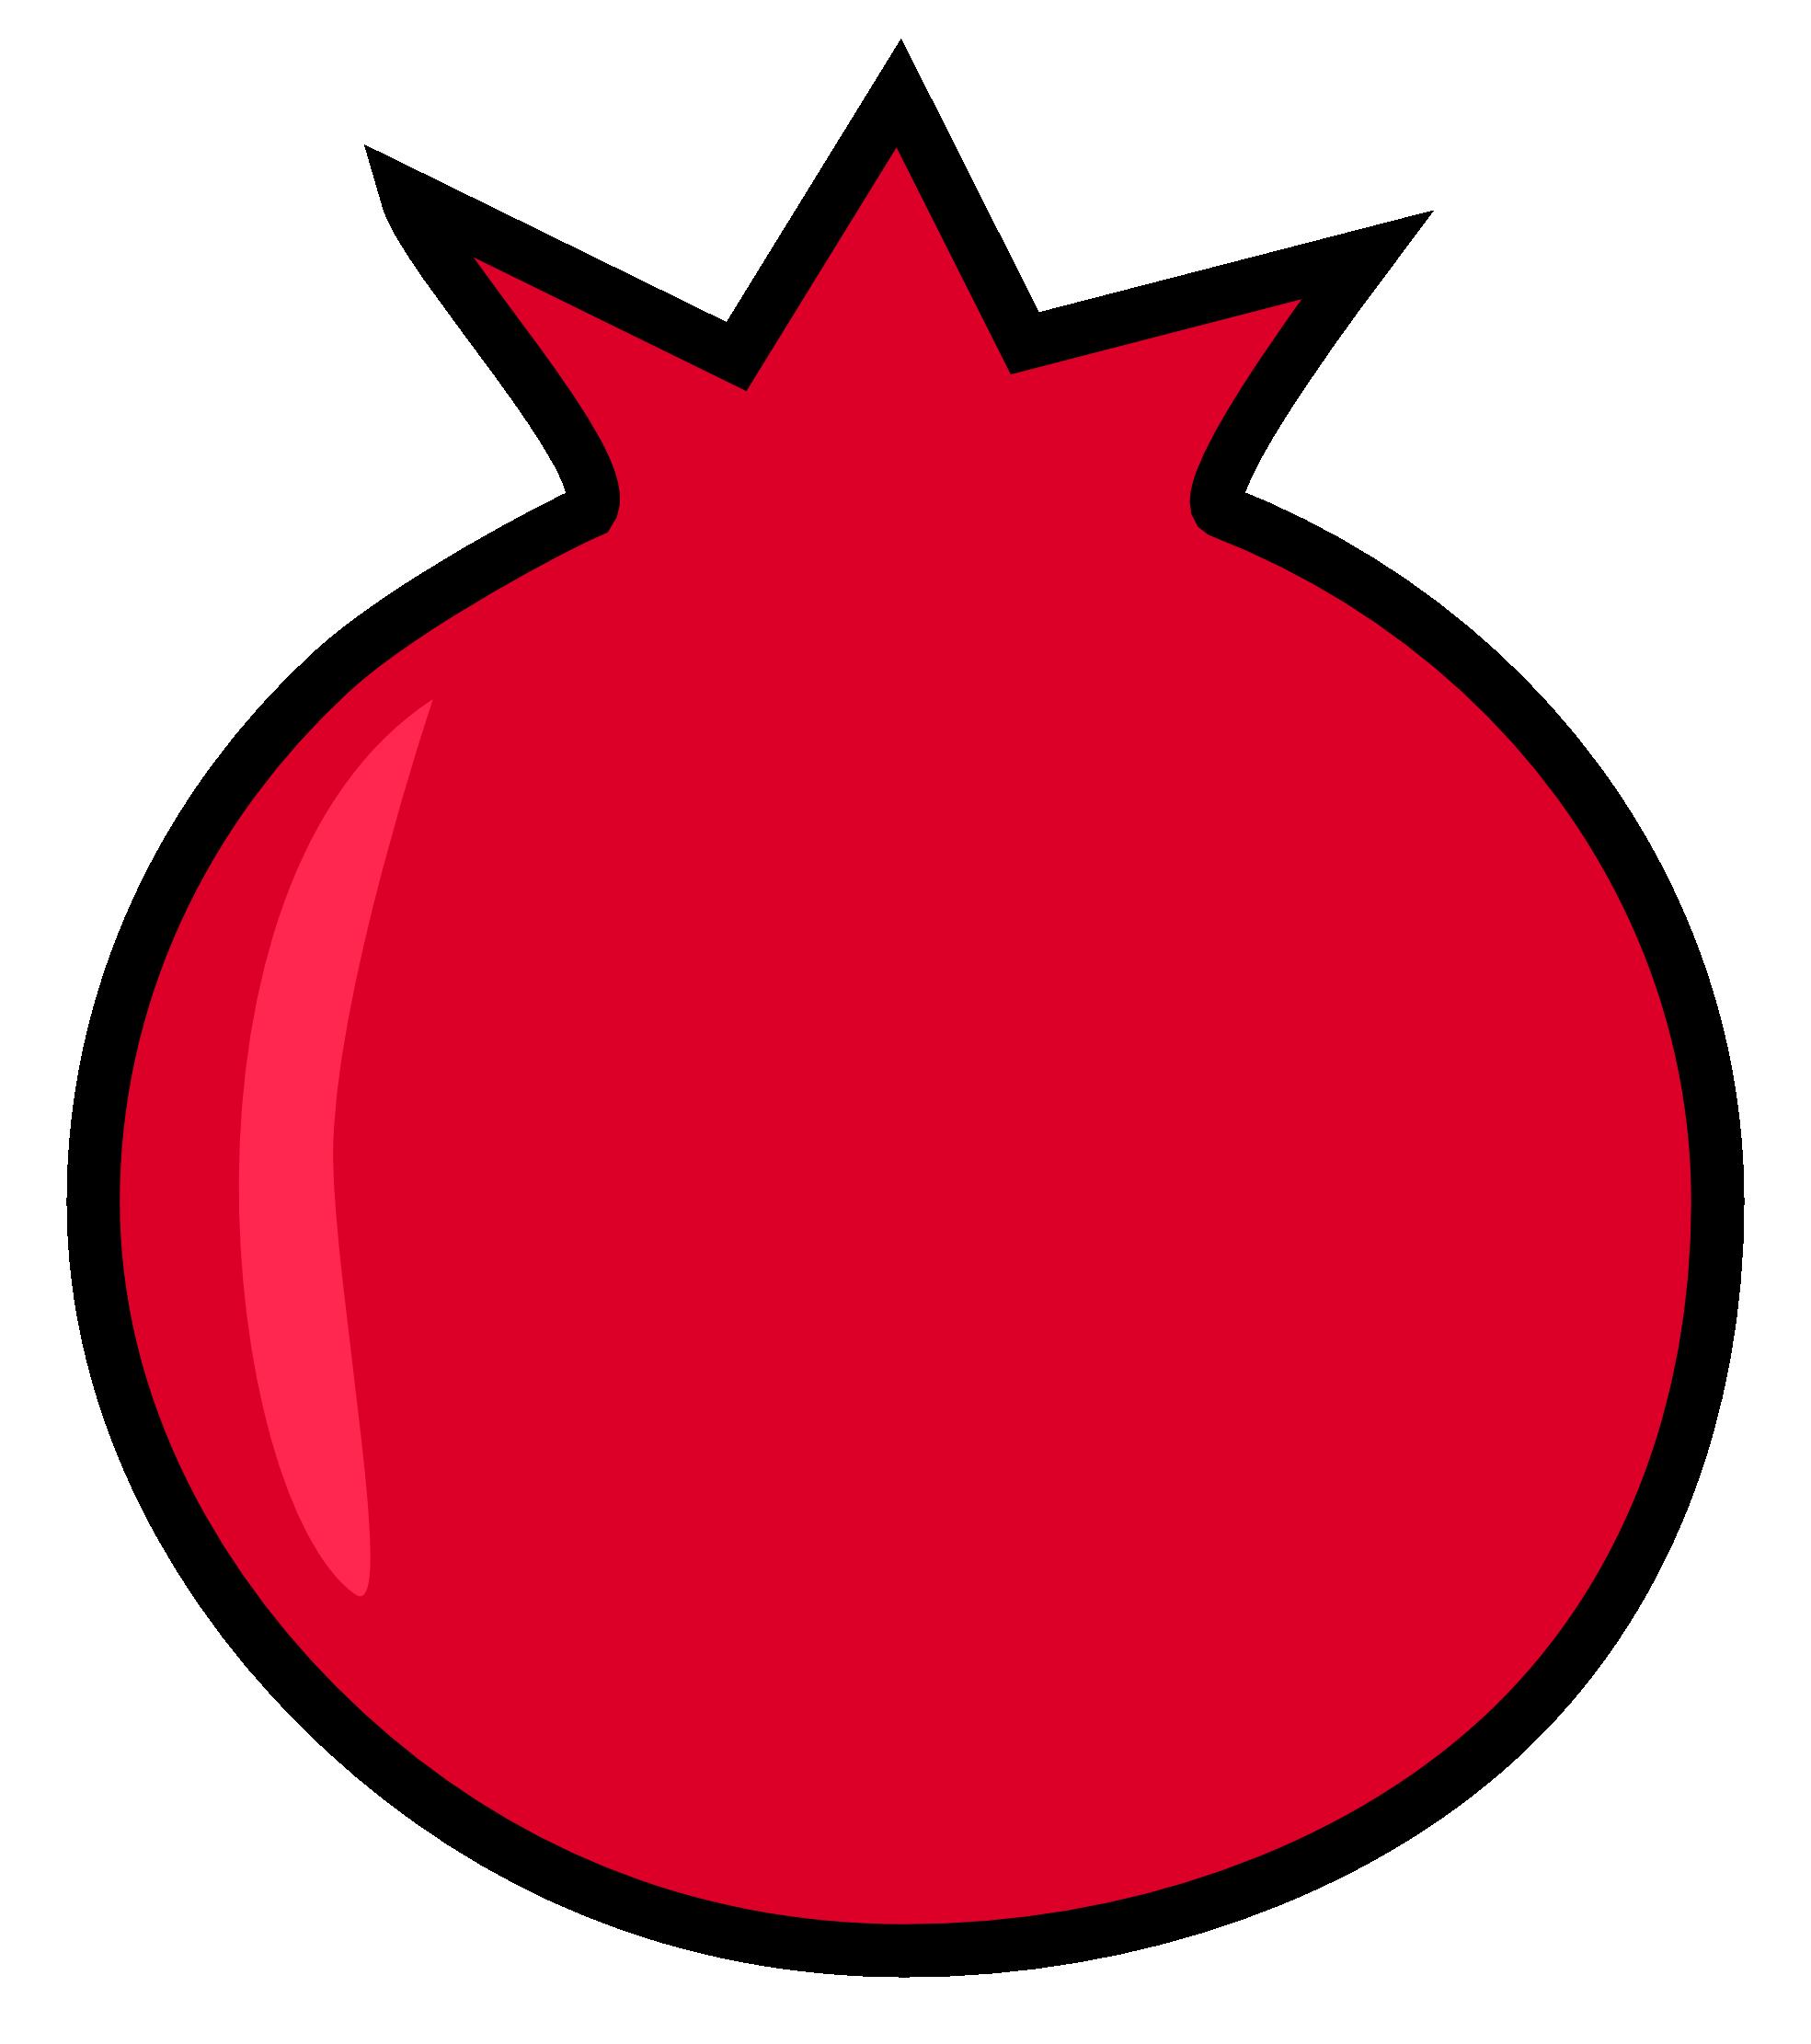 Pomegranate clipart vector Clipart pomegranate%20clipart Clipart Panda Pomegranate